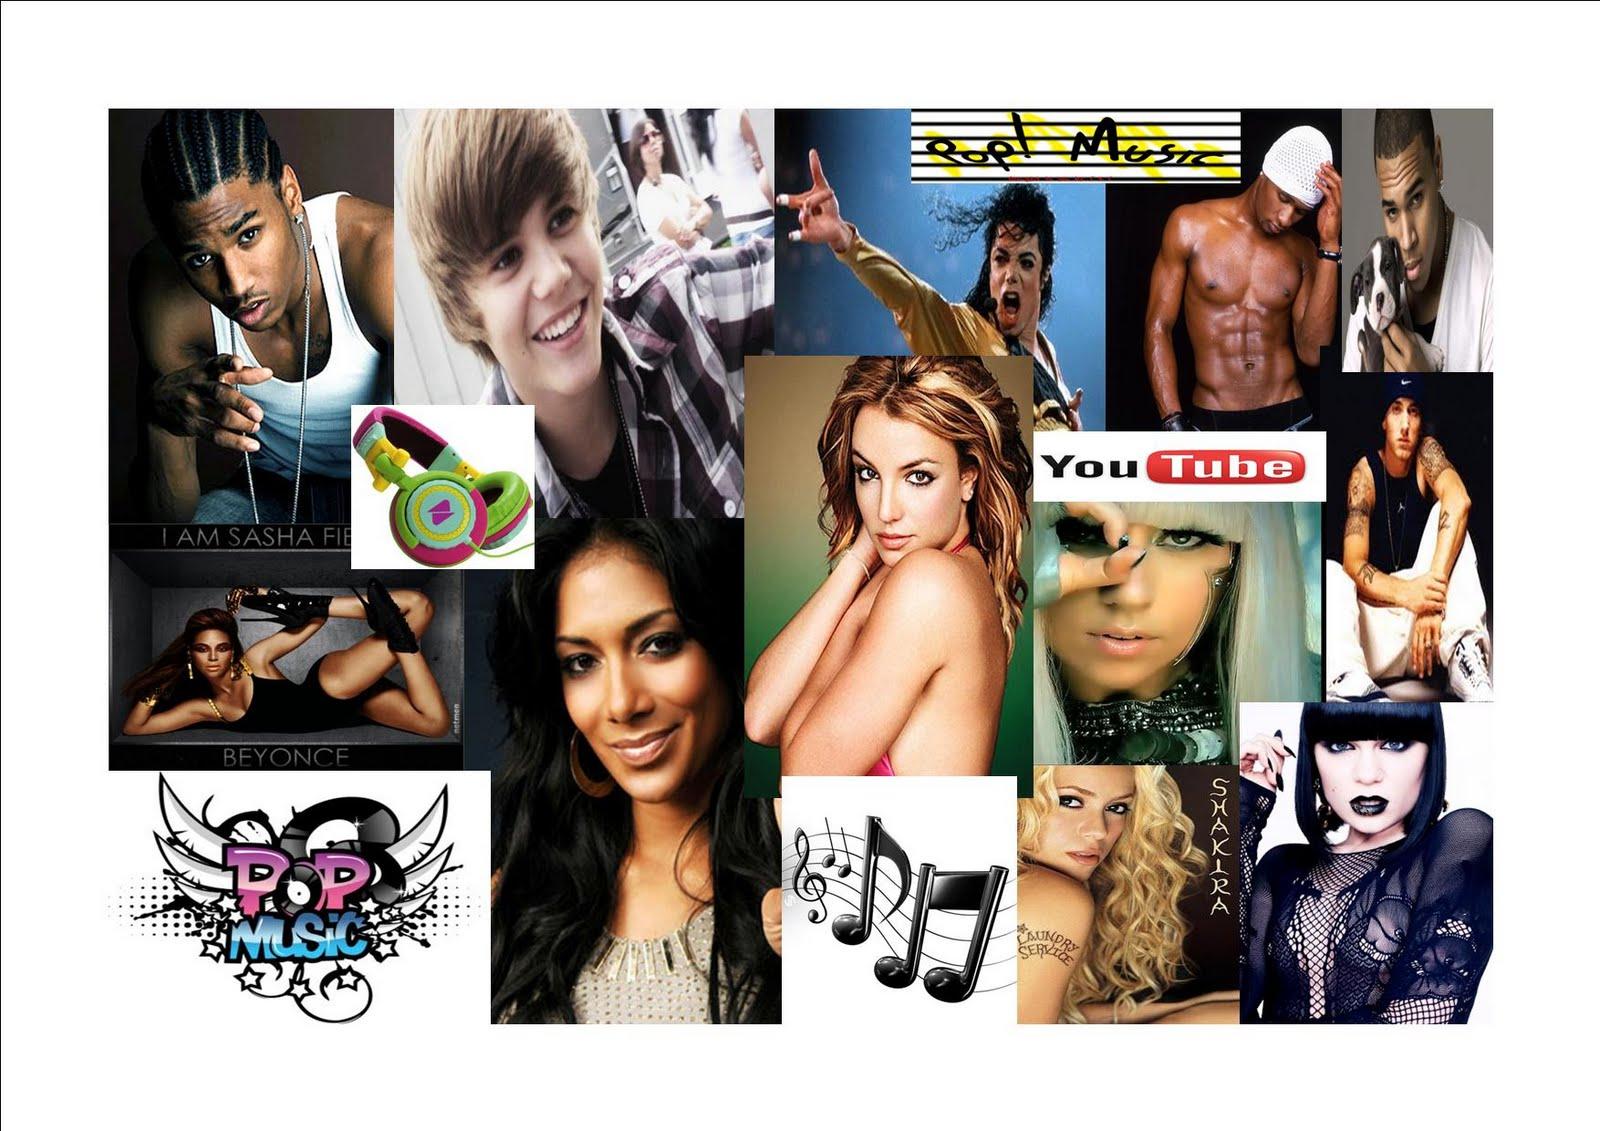 Pop music mood board